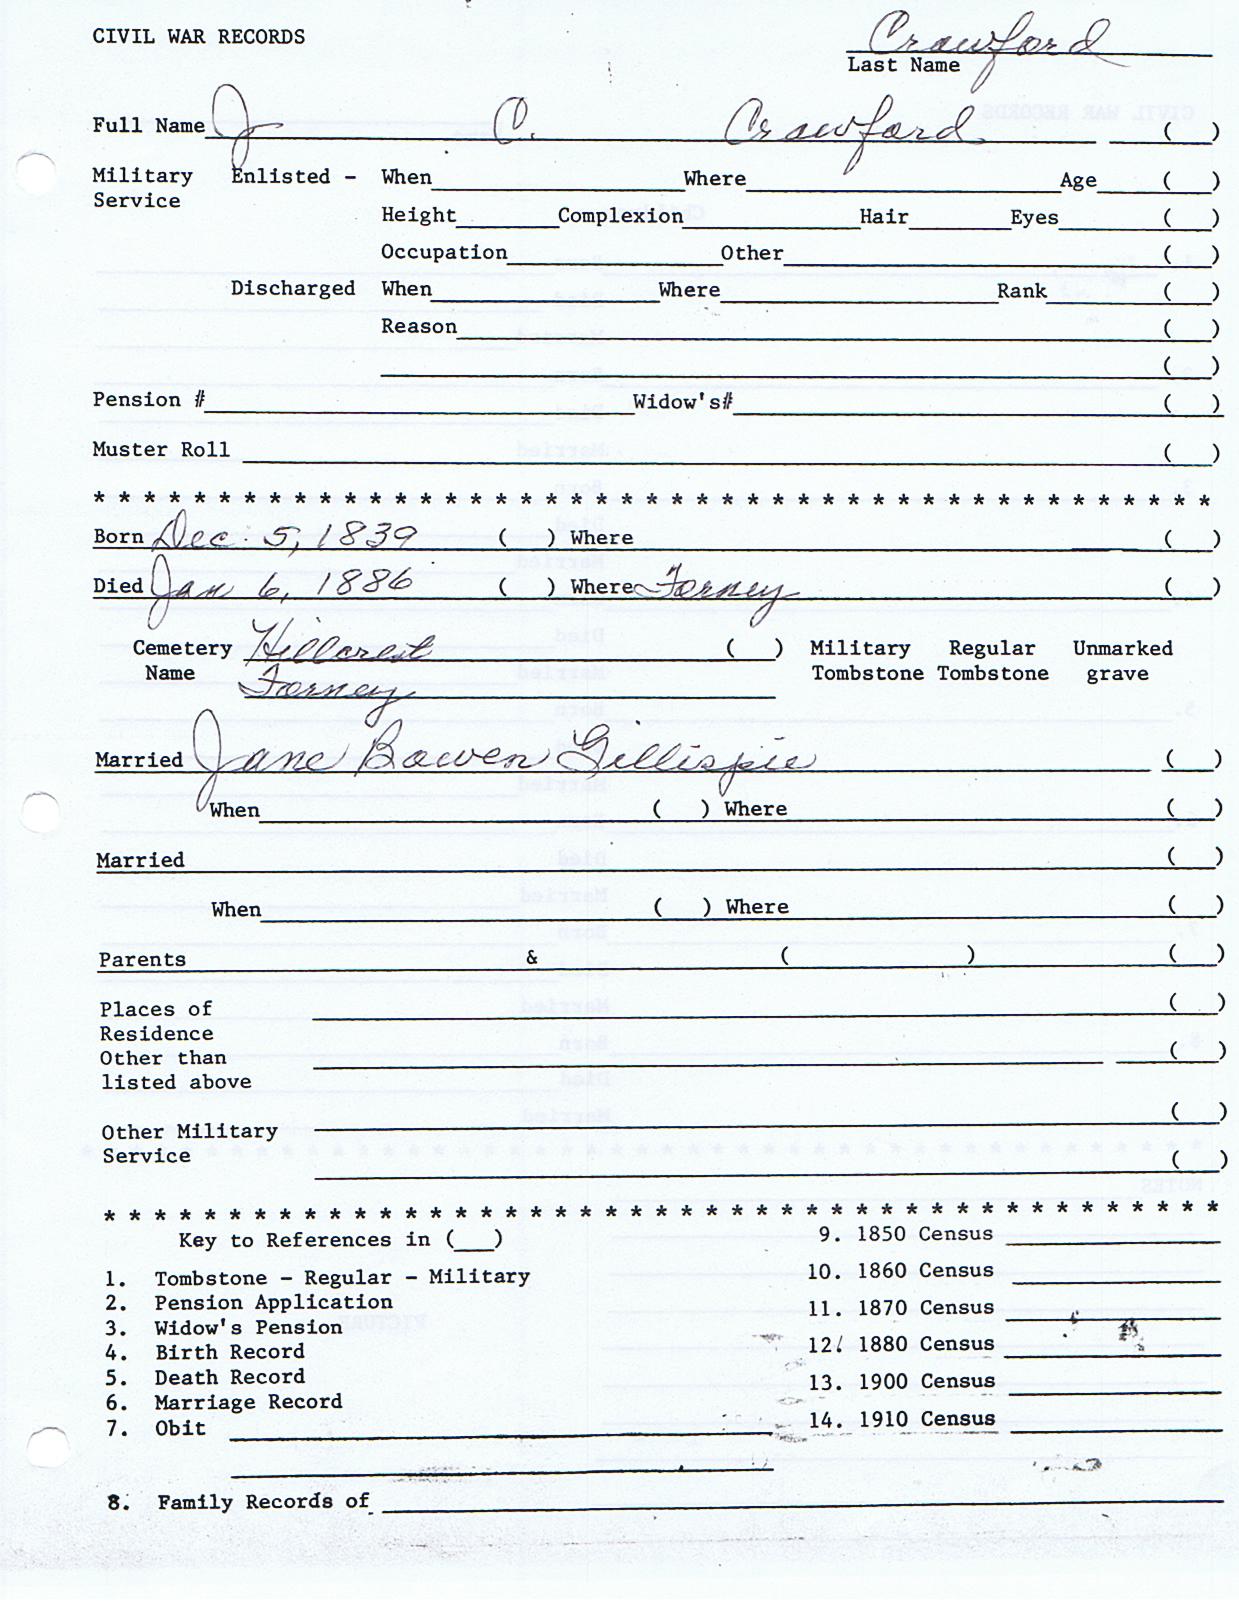 crawford-kaufman_civil_war_records-3562